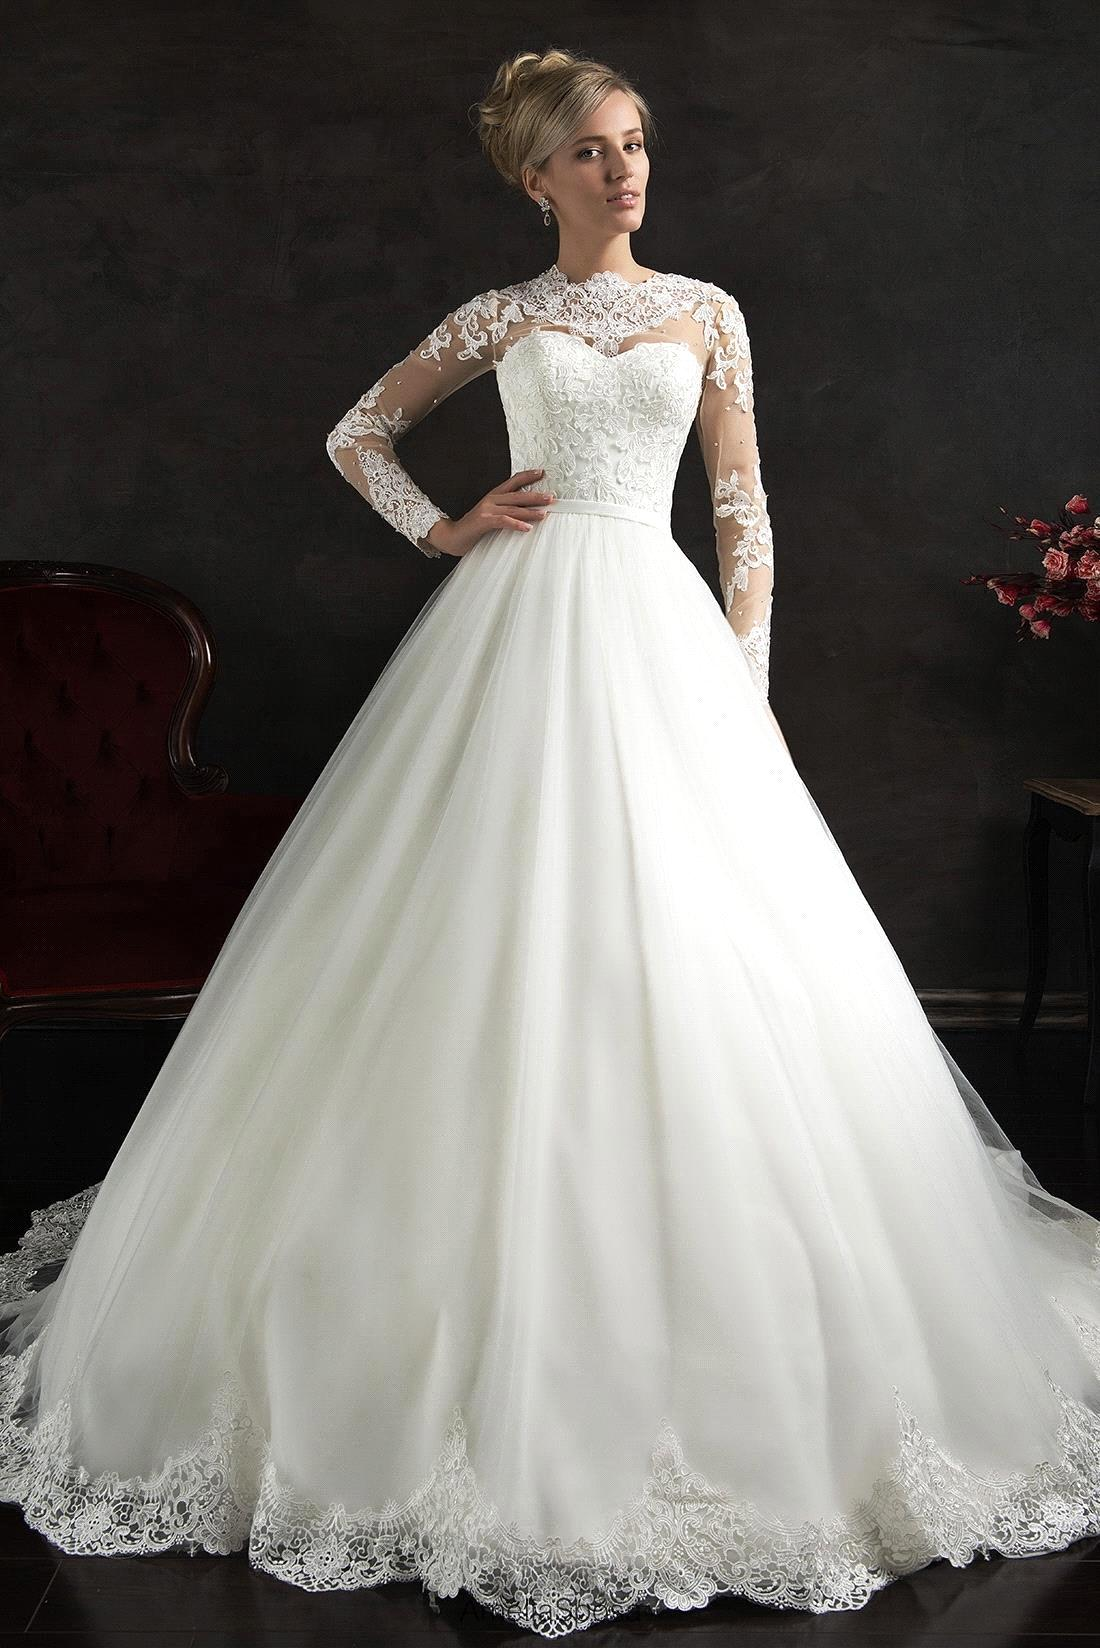 Aliexpress Buy New Arrival Robe De Mariage White